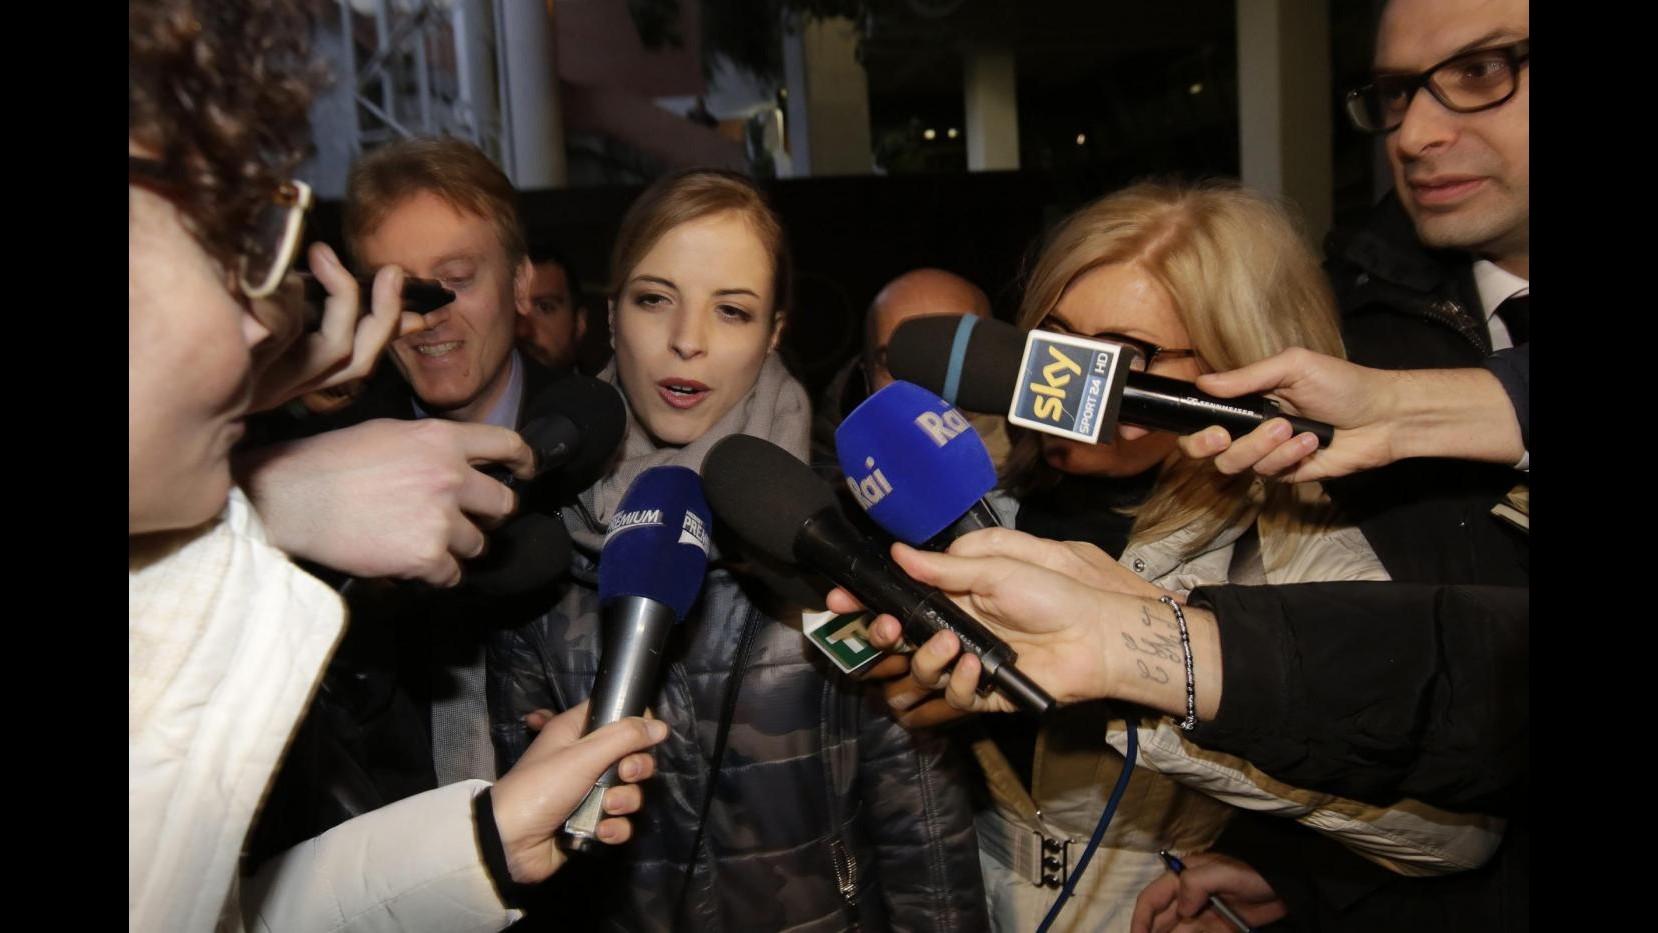 Doping, Carolina Kostner squalificata 16 mesi: Ho subito un'ingiustizia